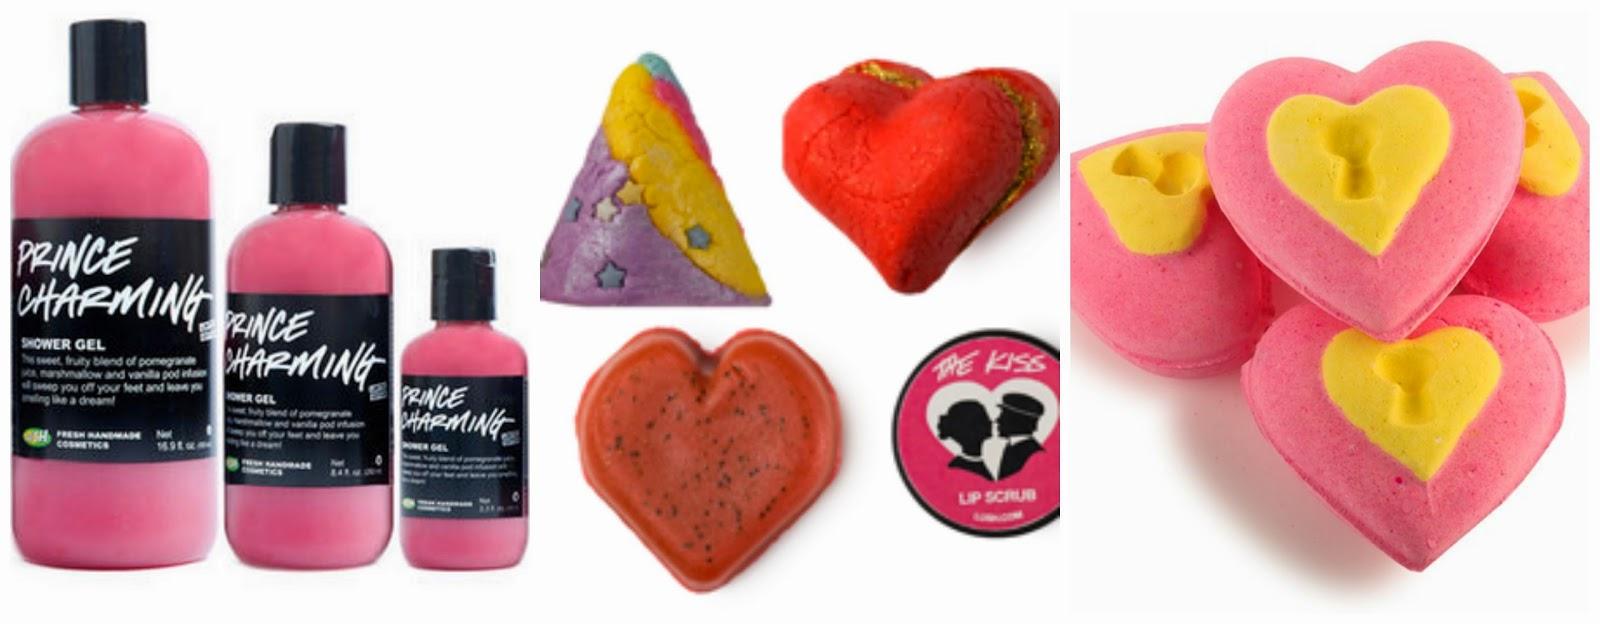 Lush Valentines Day 2015